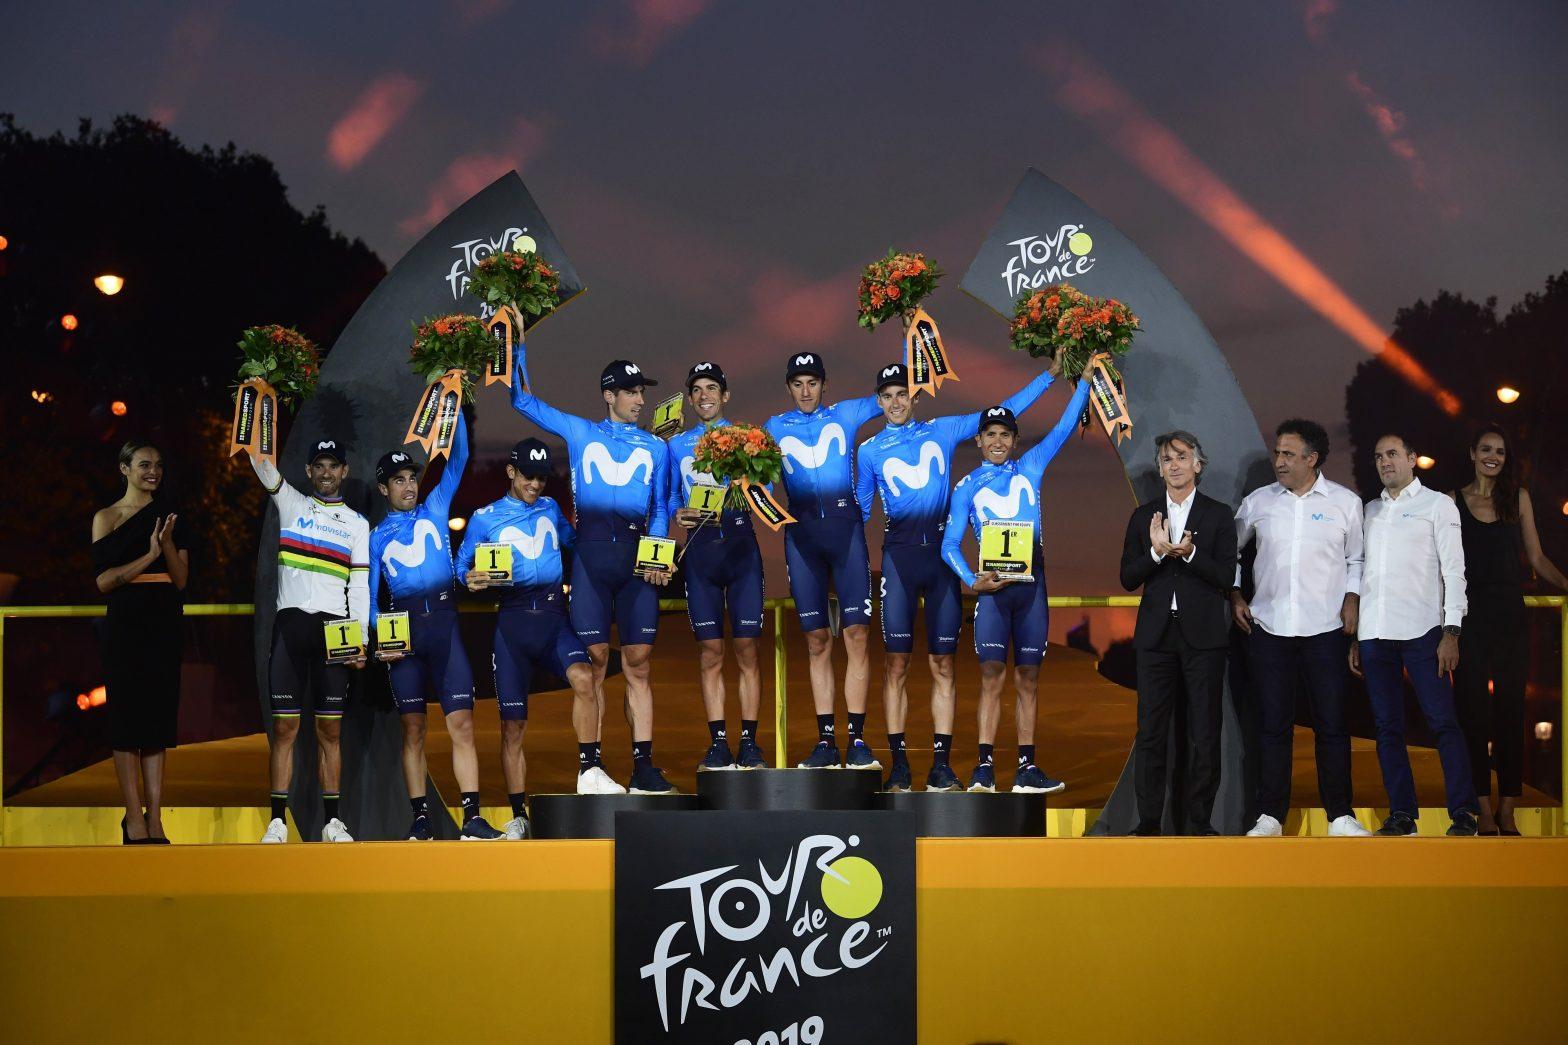 Tour de France 2019 - Movistar